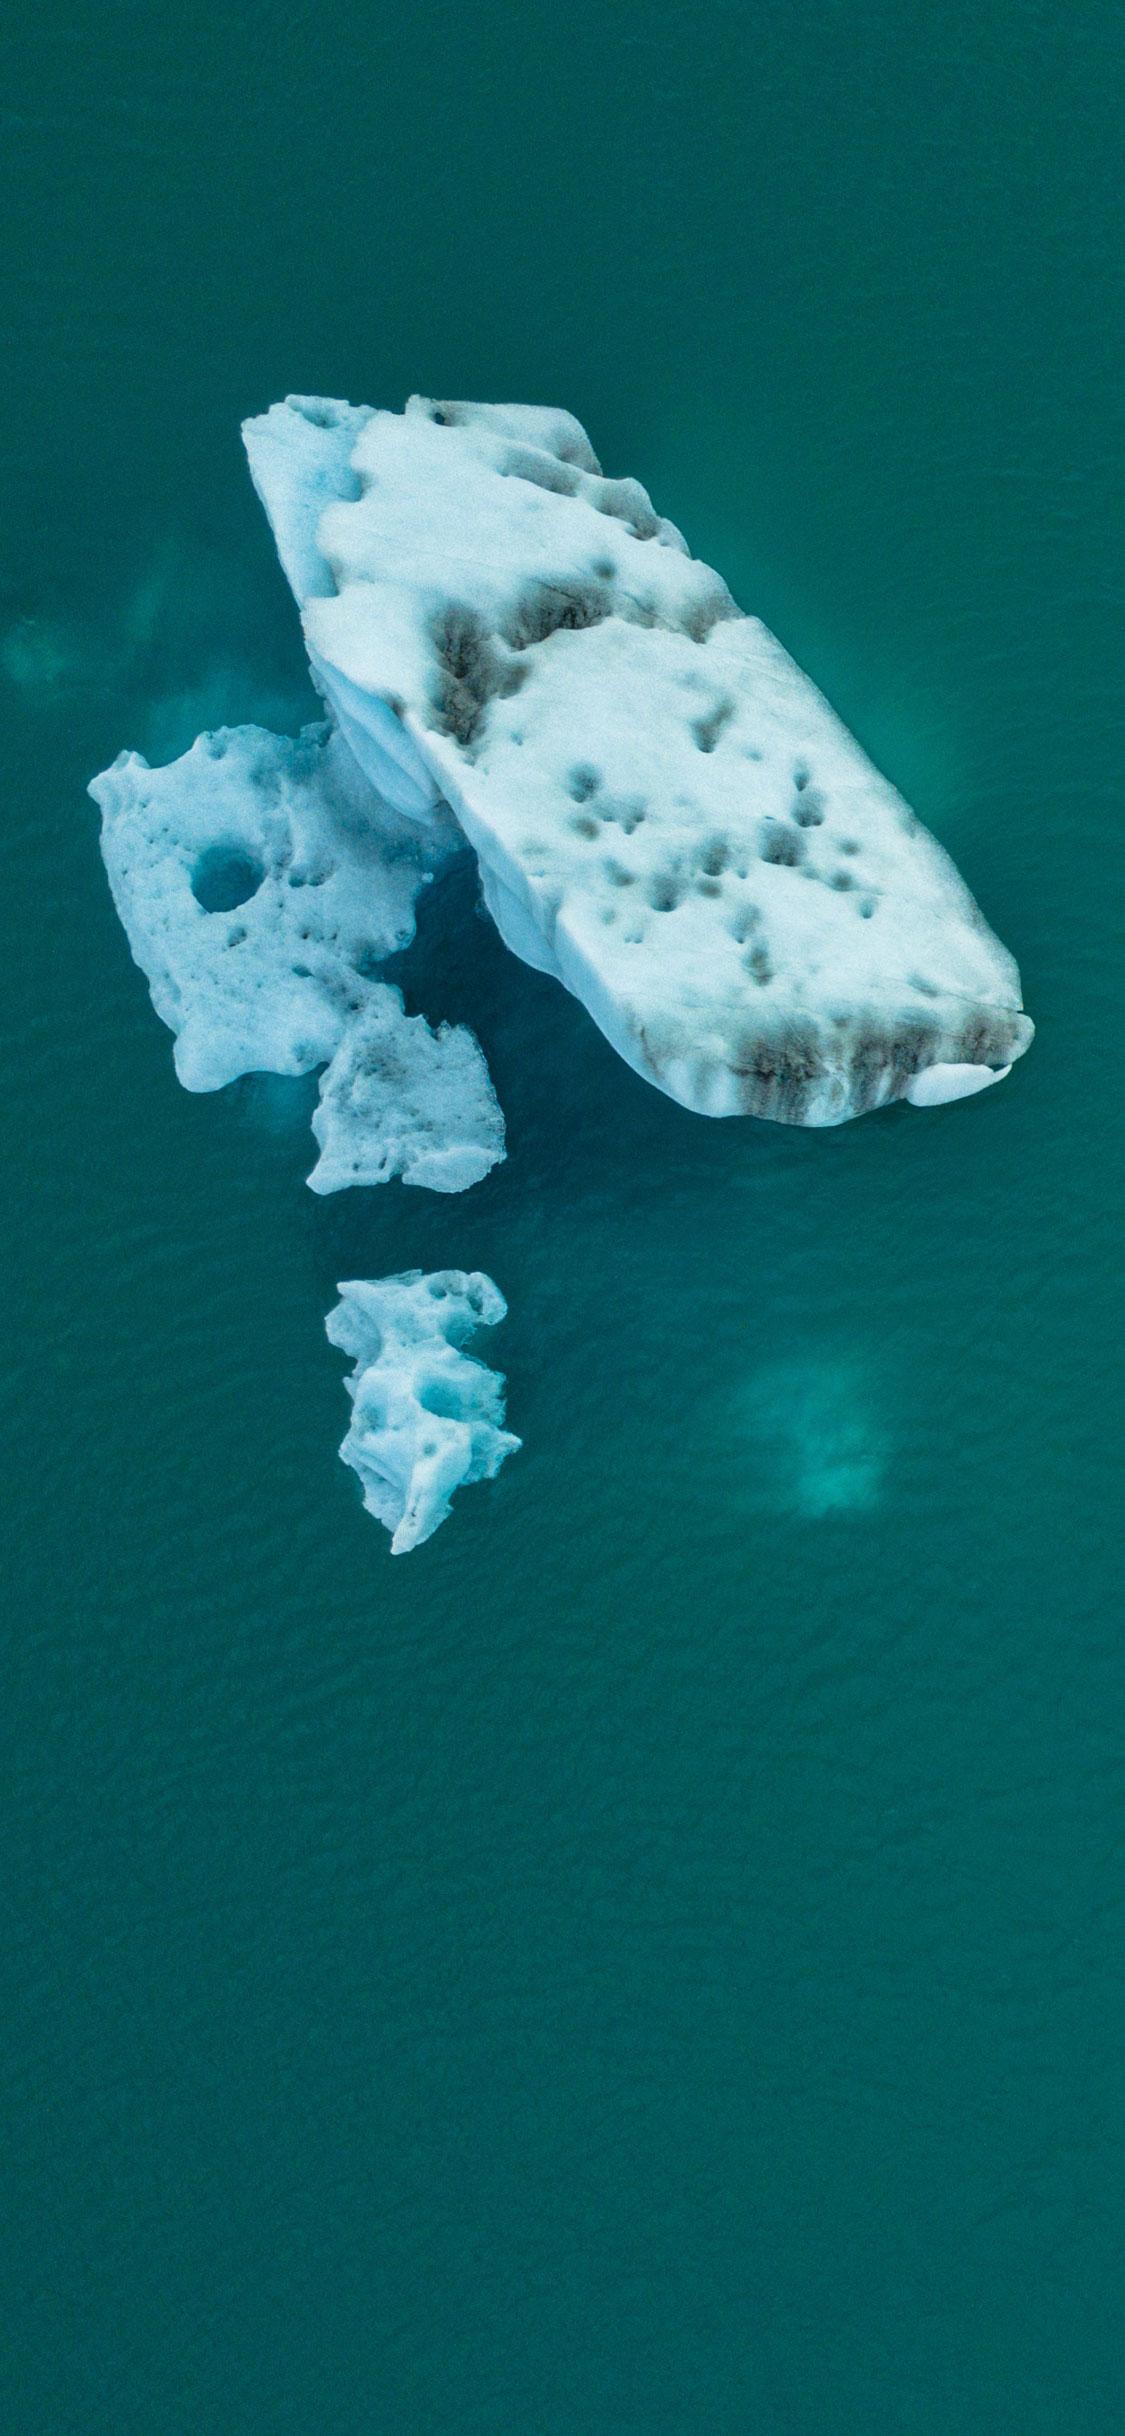 iPhone wallpaper iceberg green Iceberg